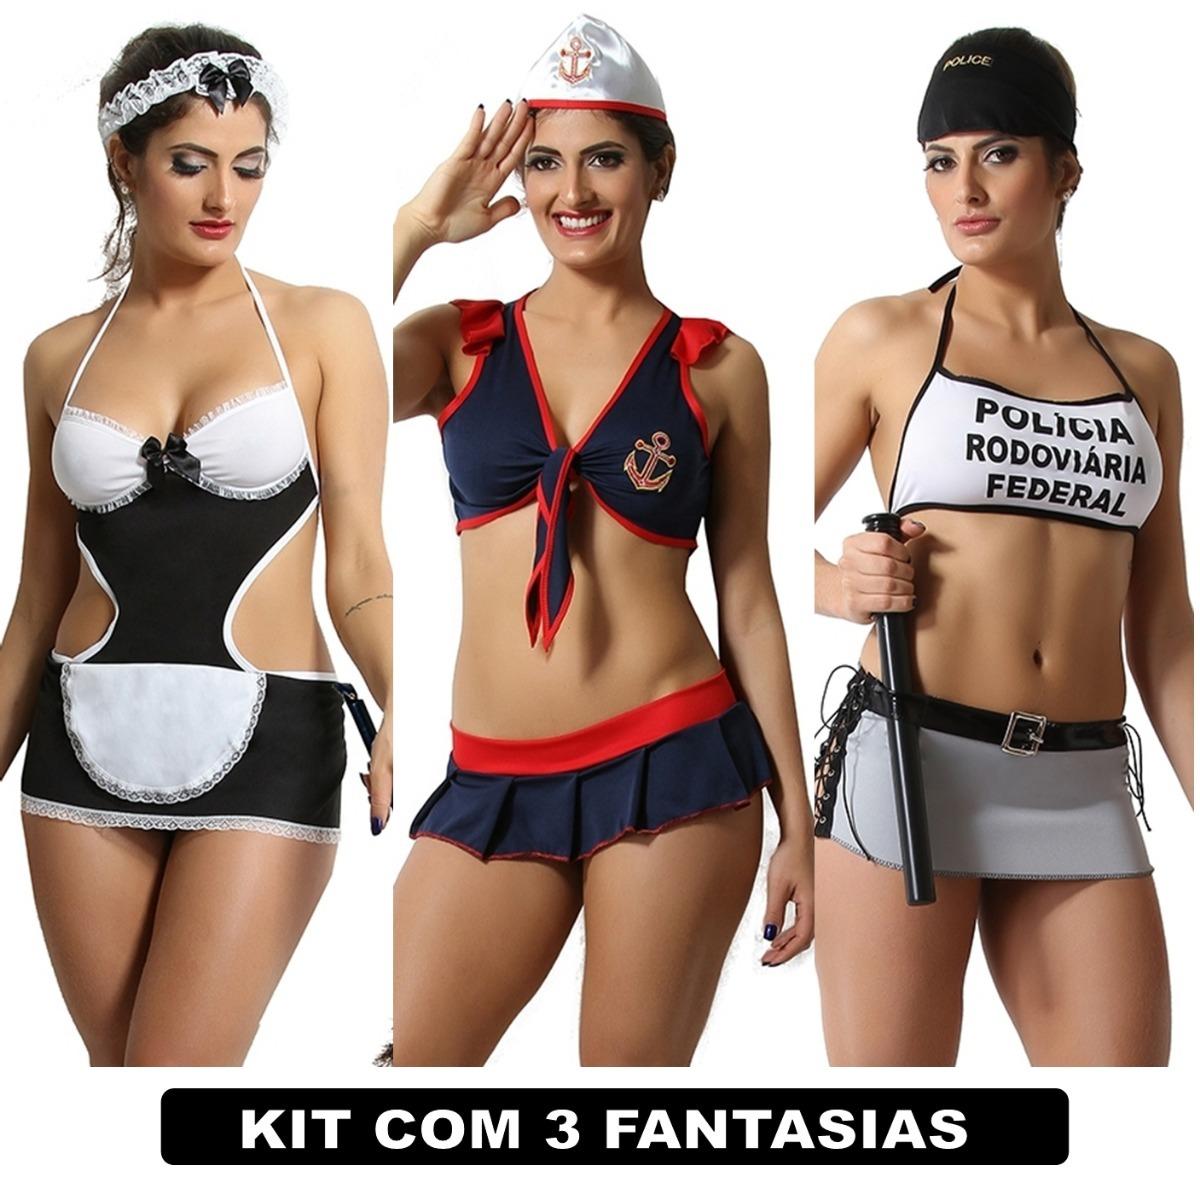 bfc248db8 Conjuntos Femininos Lingerie Atacado Kit Com 3 Conjunto - R  135